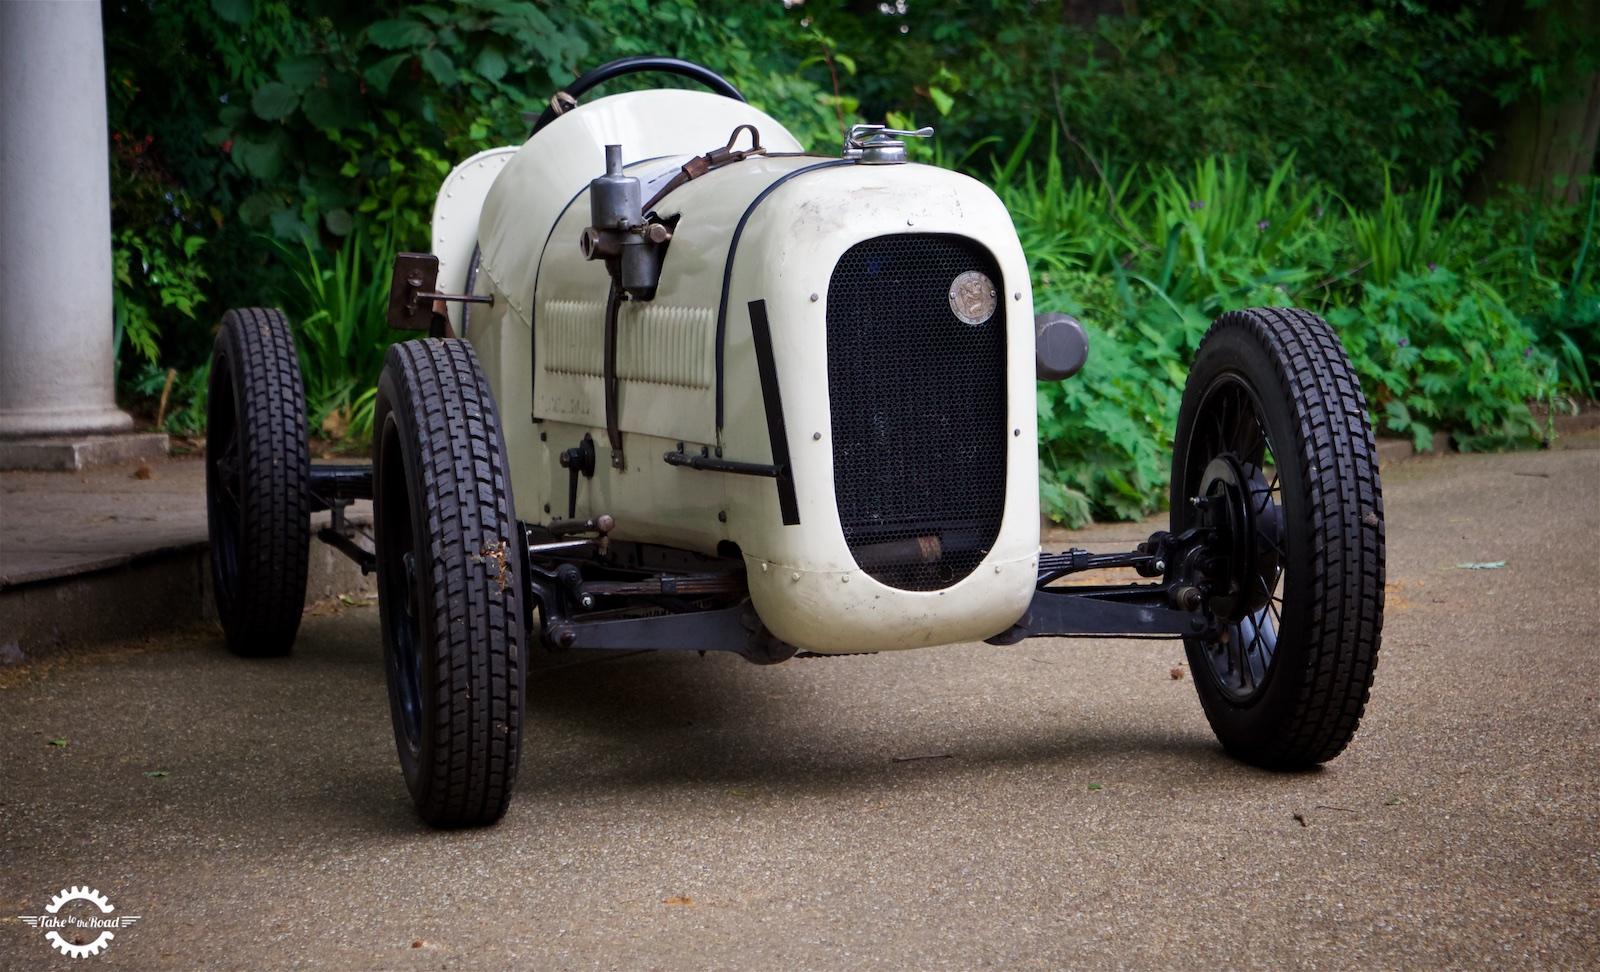 Belgravia Classic Car Show 2019 Highlights